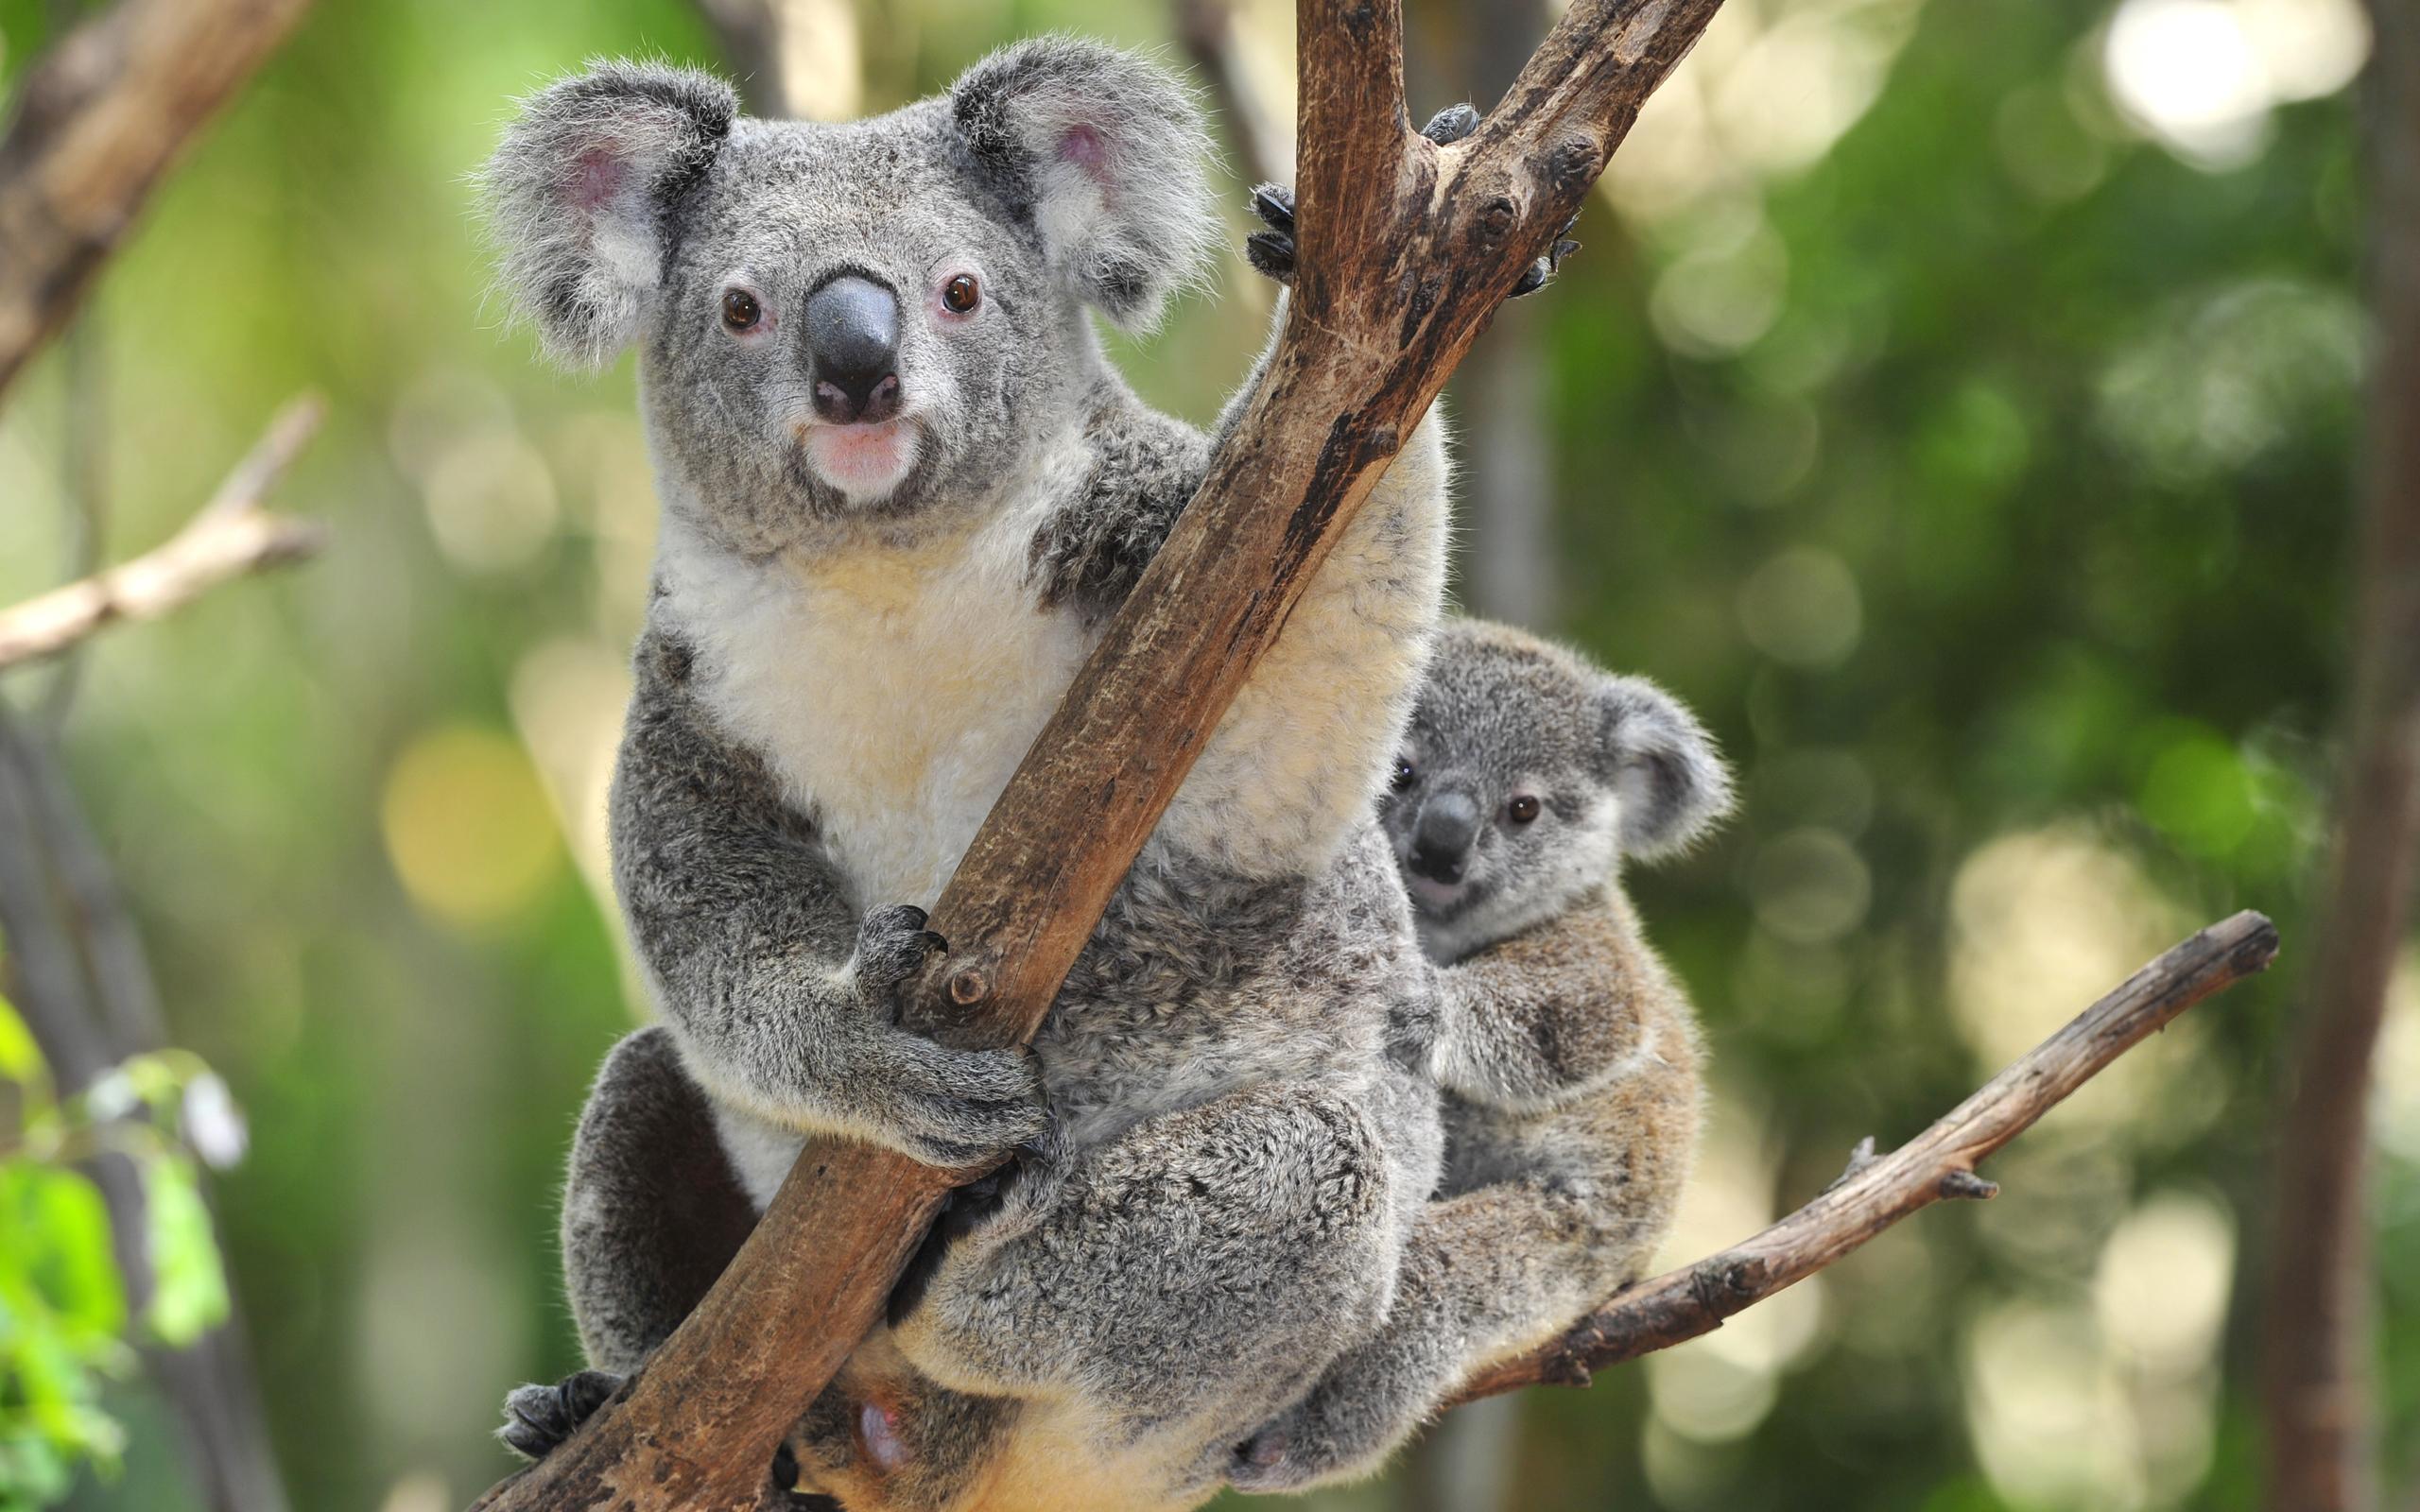 Animal - Koala Wallpaper